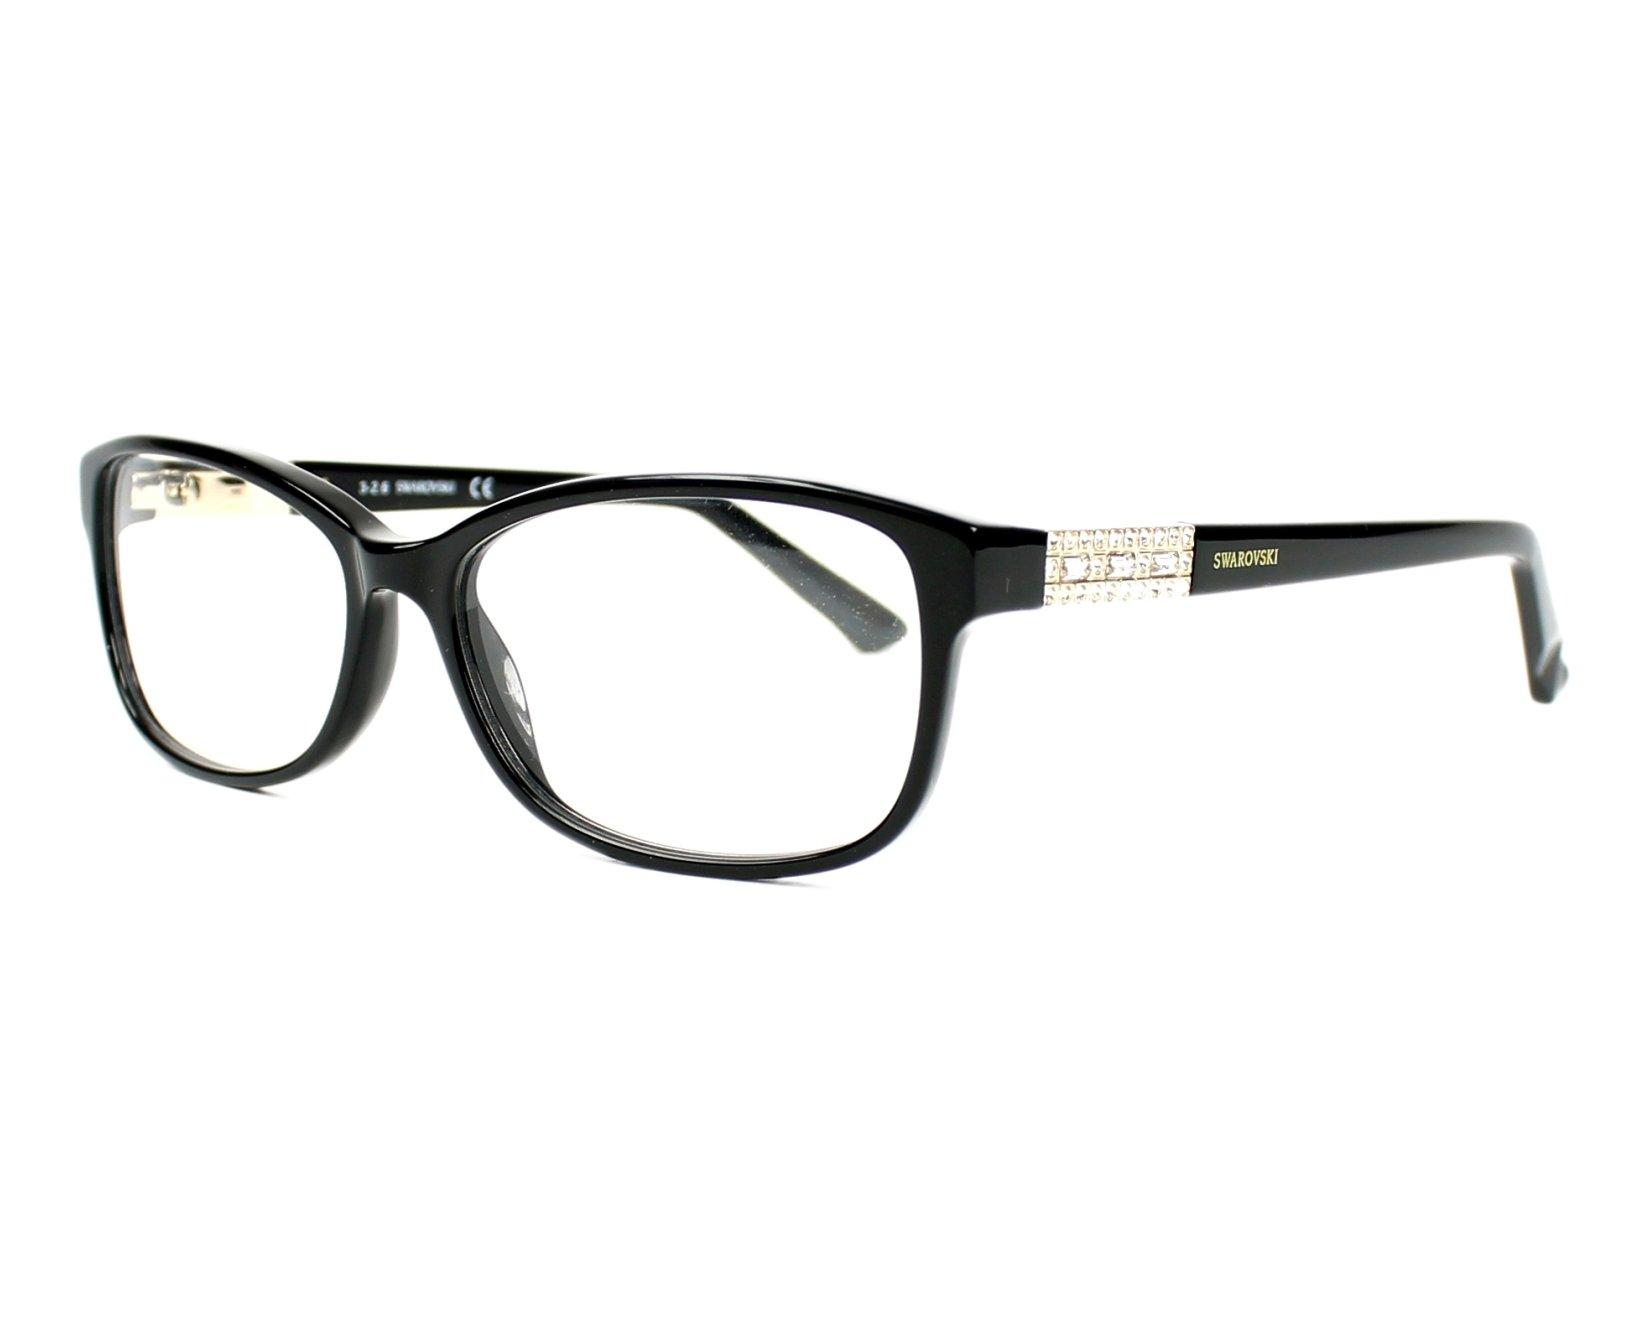 91e4e0a8ce4 Swarovski Eyeglasses - Bitterroot Public Library